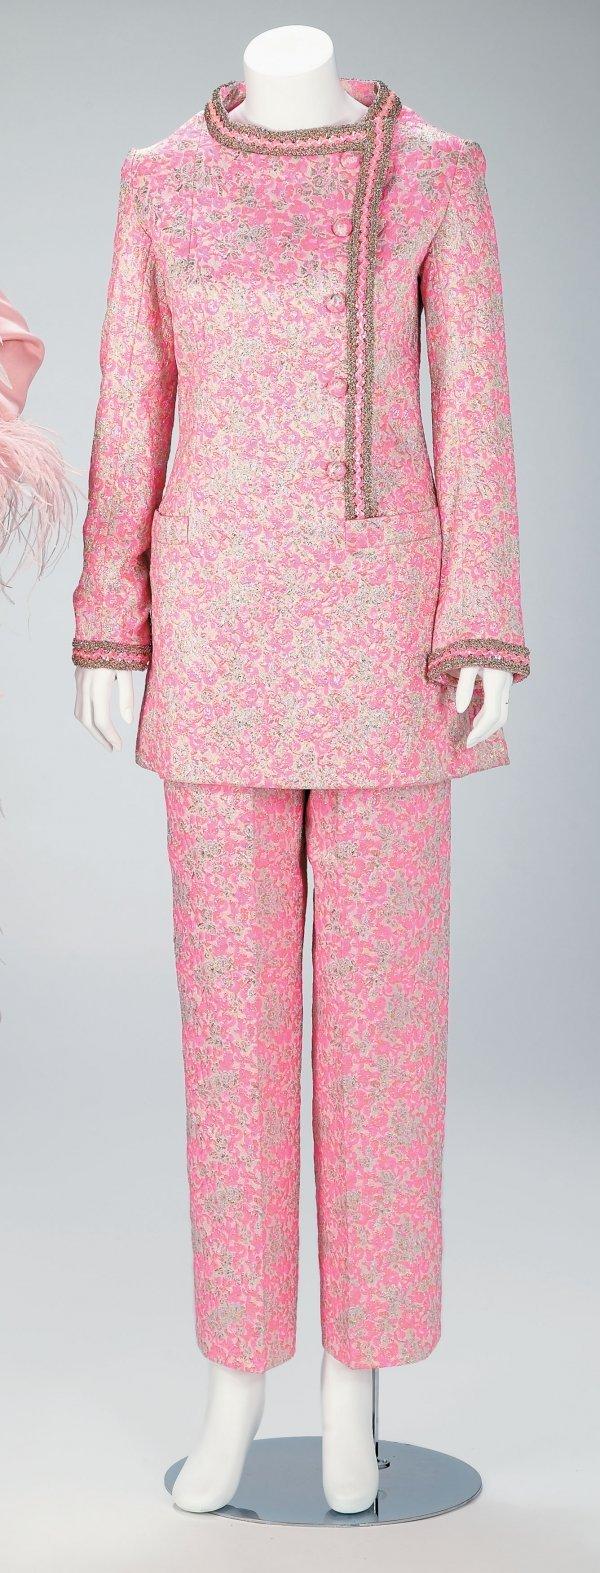 1017: Jean Patou pink metallic brocade tunic and pants,